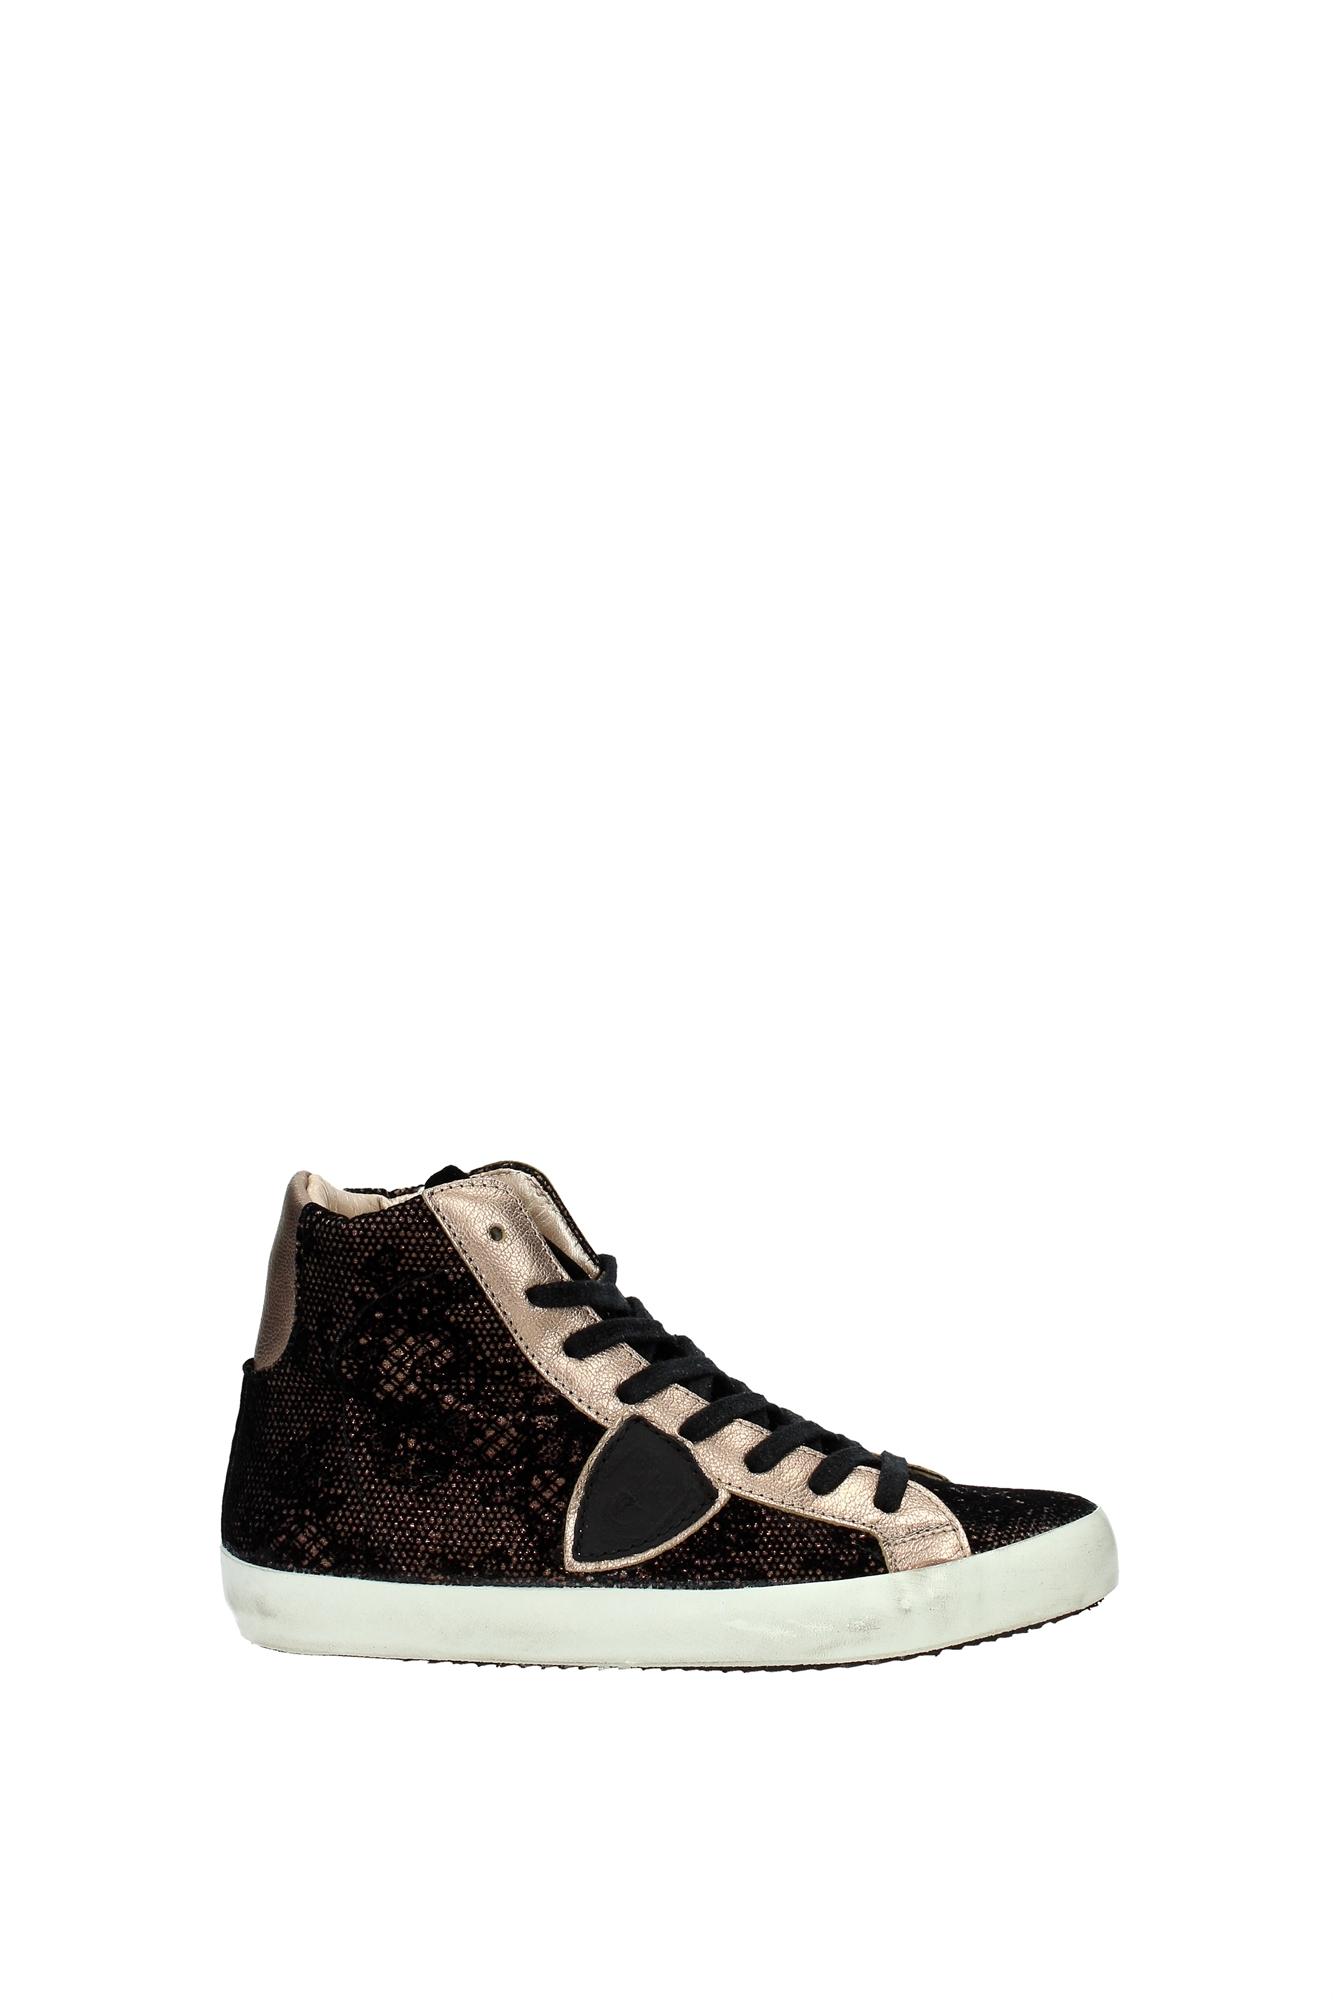 sneakers philippe model damen stoff schwarz clhdbq01 ebay. Black Bedroom Furniture Sets. Home Design Ideas